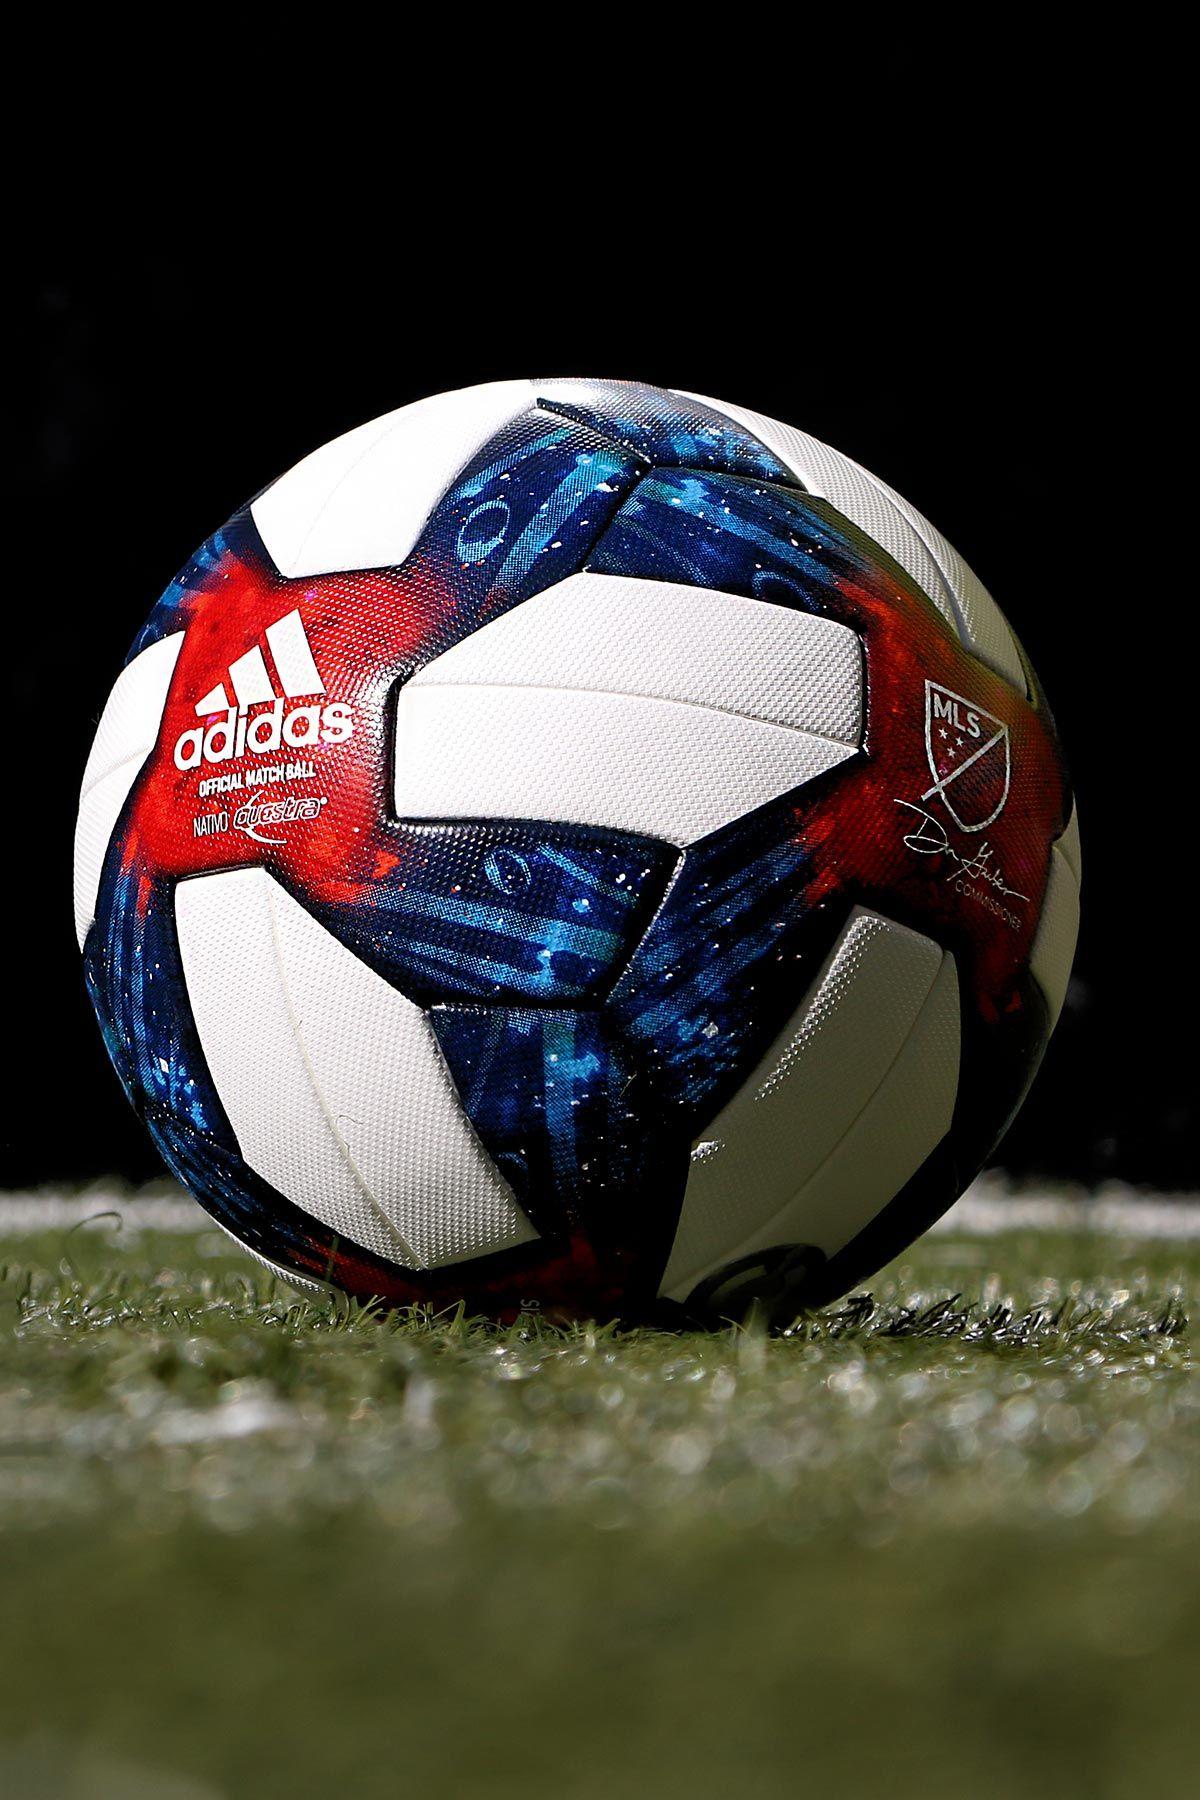 violencia Escalera Reina  uefa champions league ball azul official store bc879 762e2